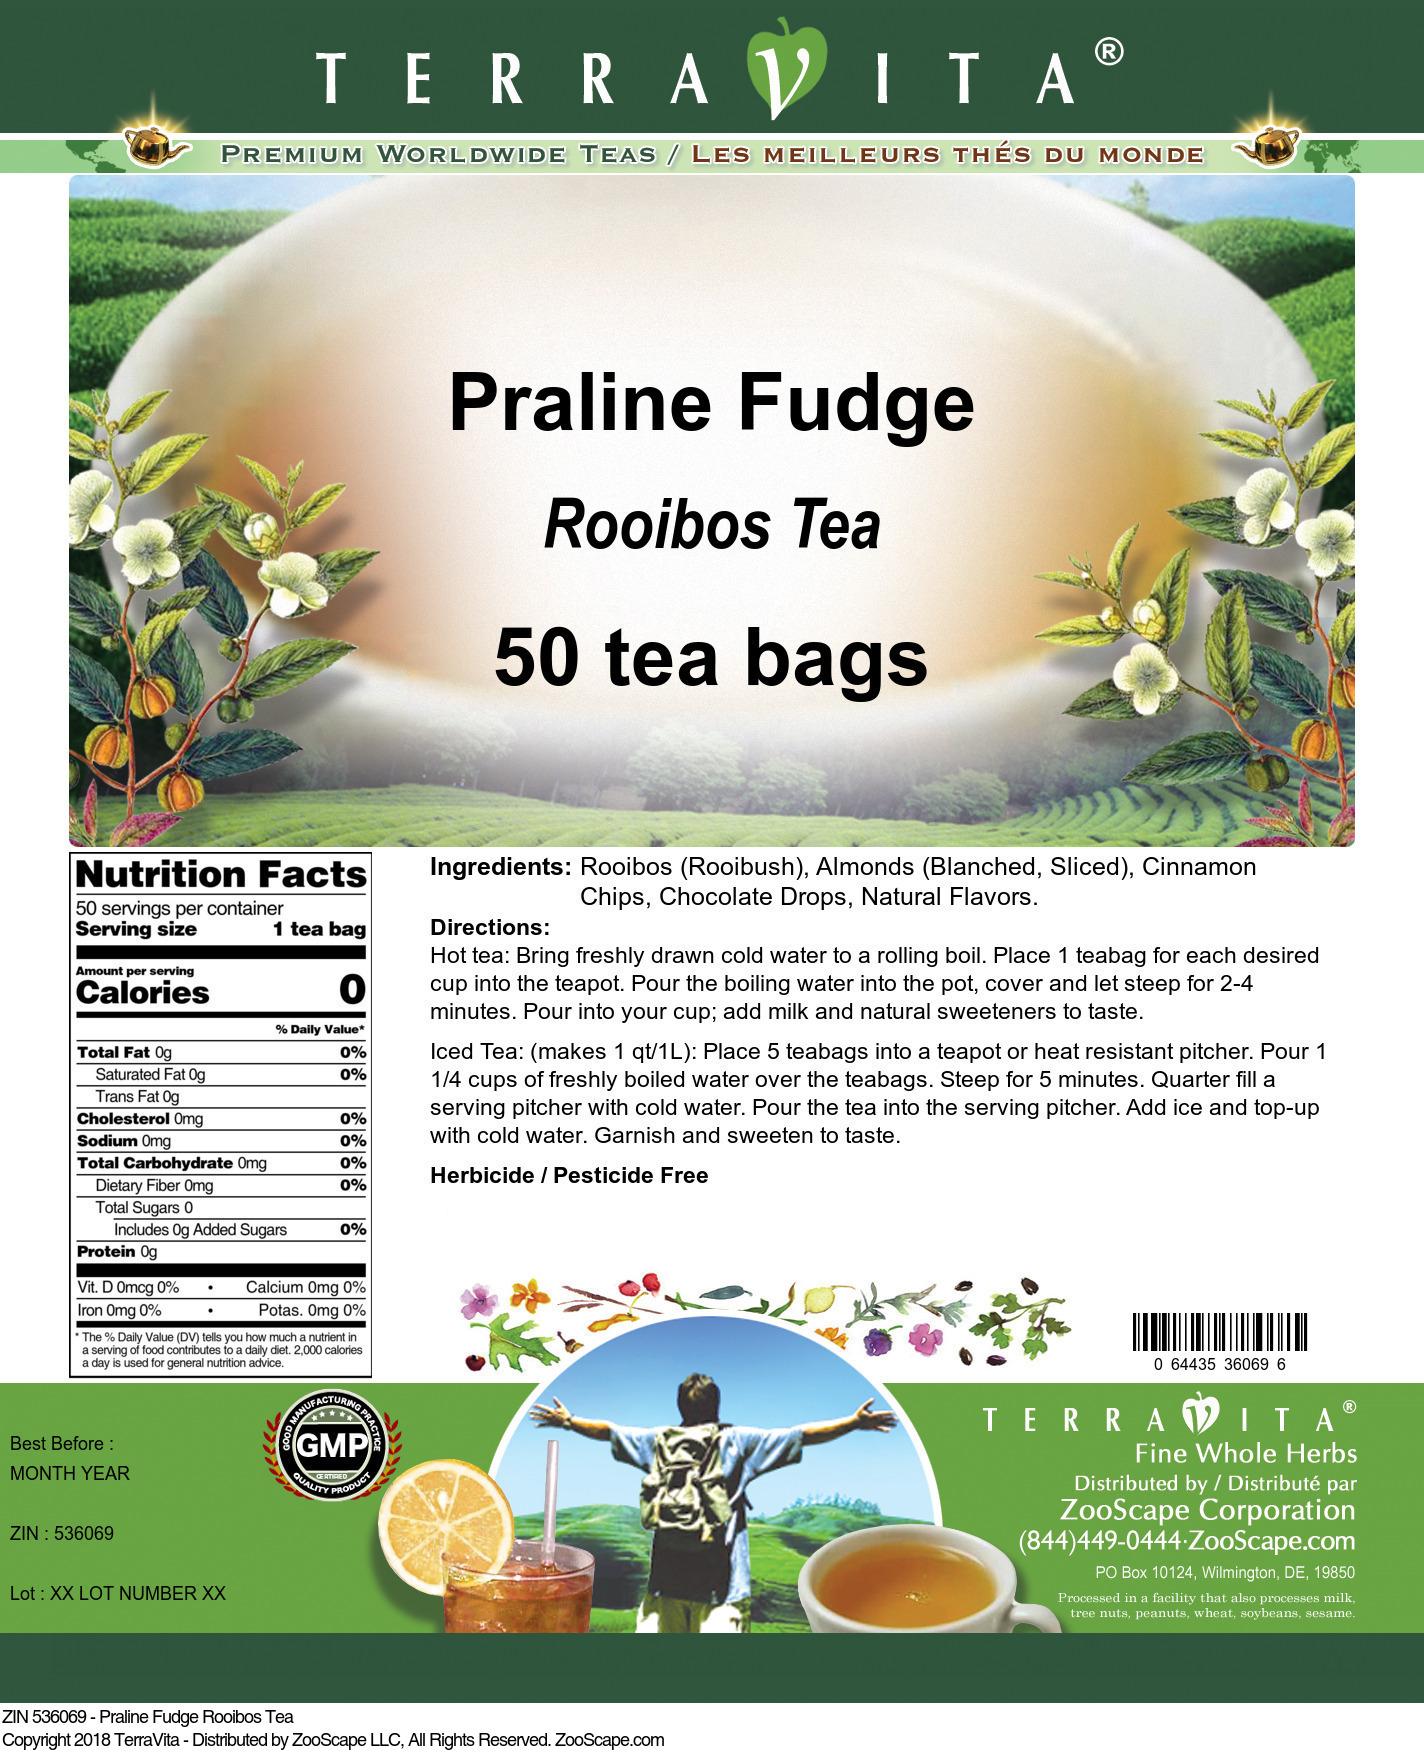 Praline Fudge Rooibos Tea